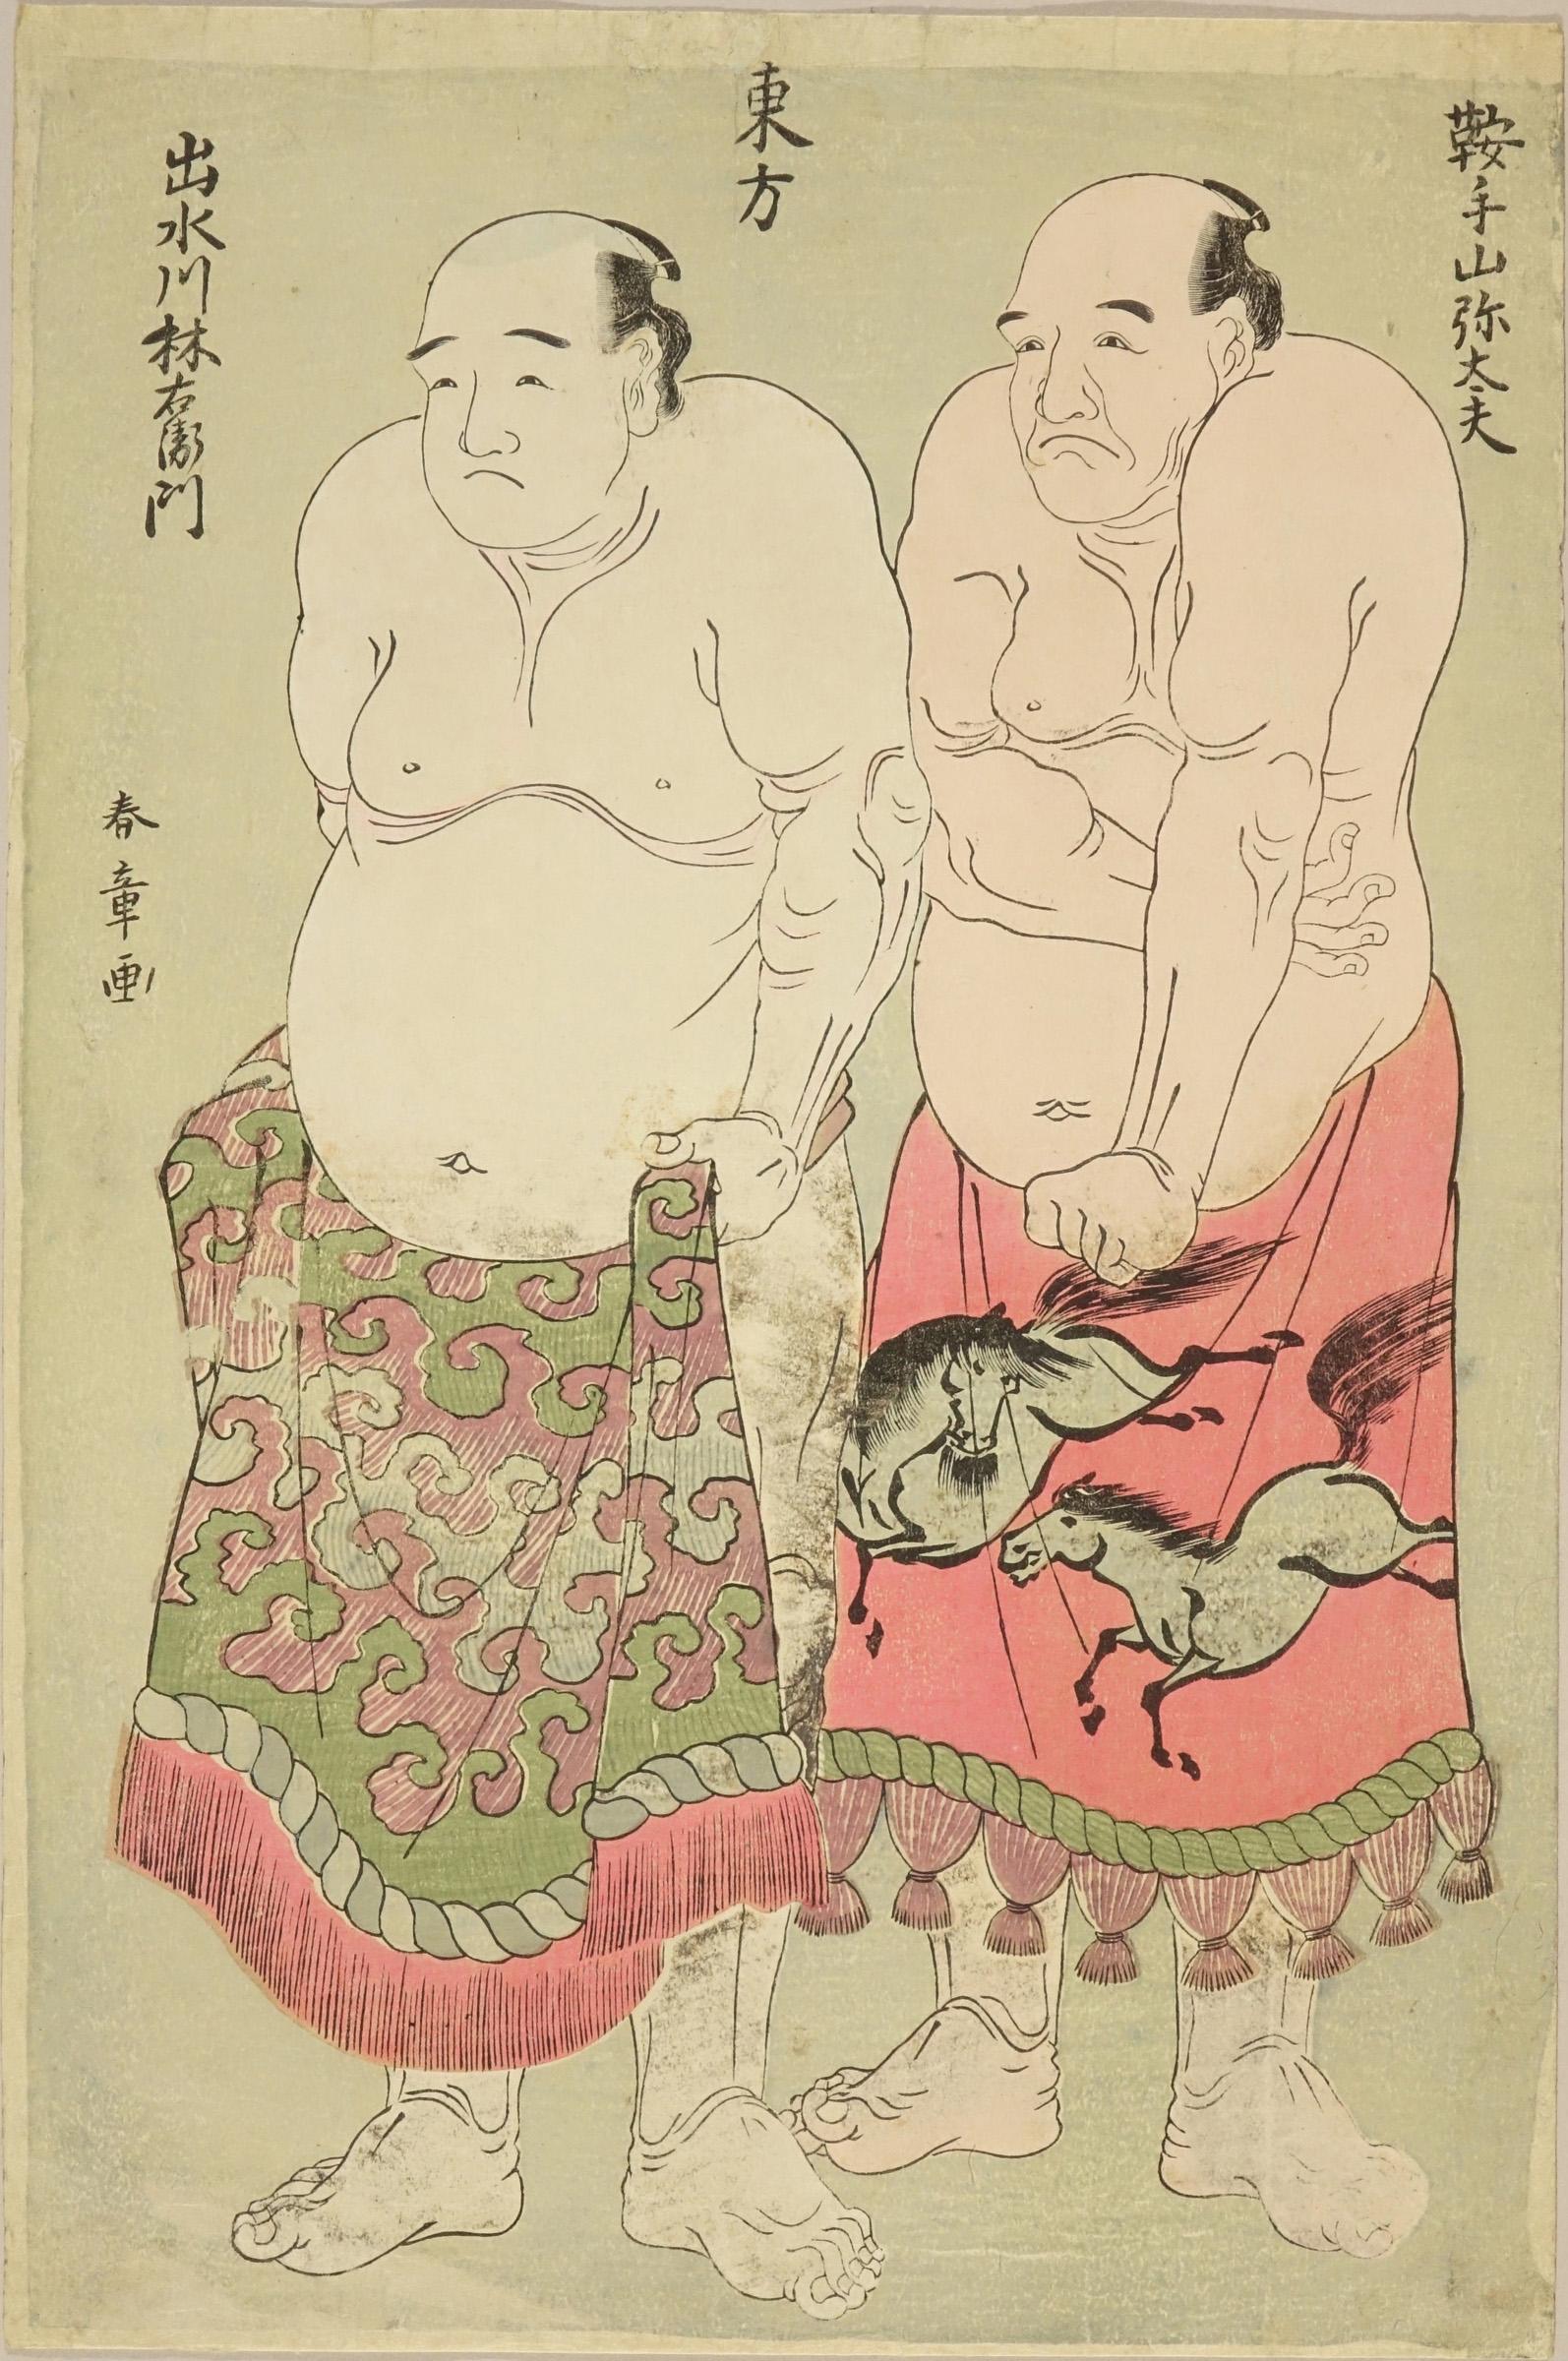 SHUNSHO Portrait of sumo wrestler Kuadeyama Yadayu (Kagoshima Pref.) and Izumigawa Rin'emon (Kagoshima Pref.)